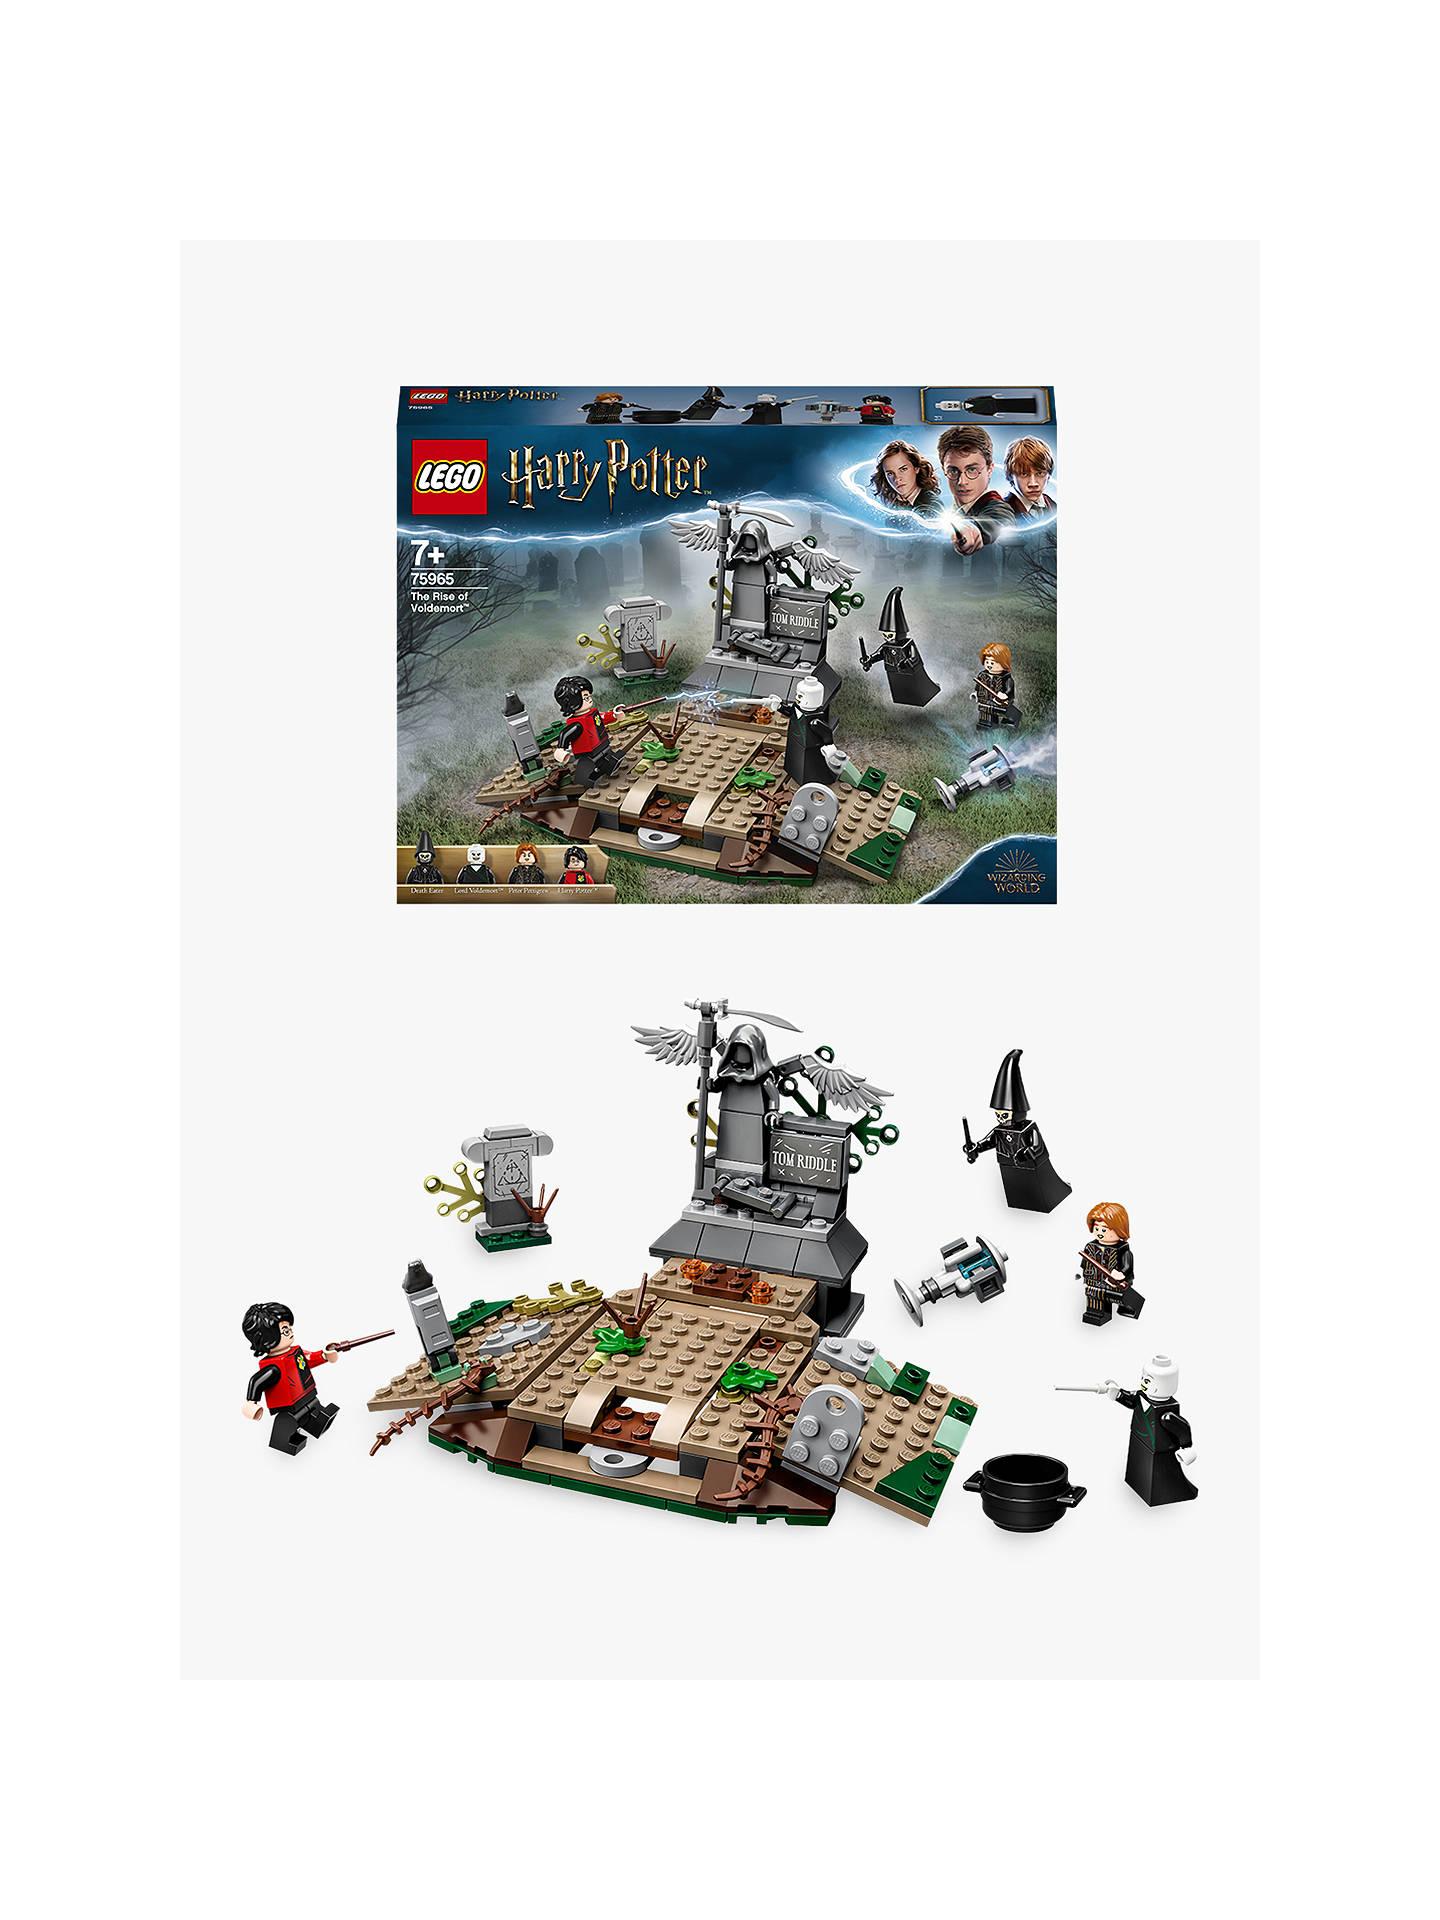 Harry Potter Death Eater Custom Minifigure Harry Potter LEGO Compatible